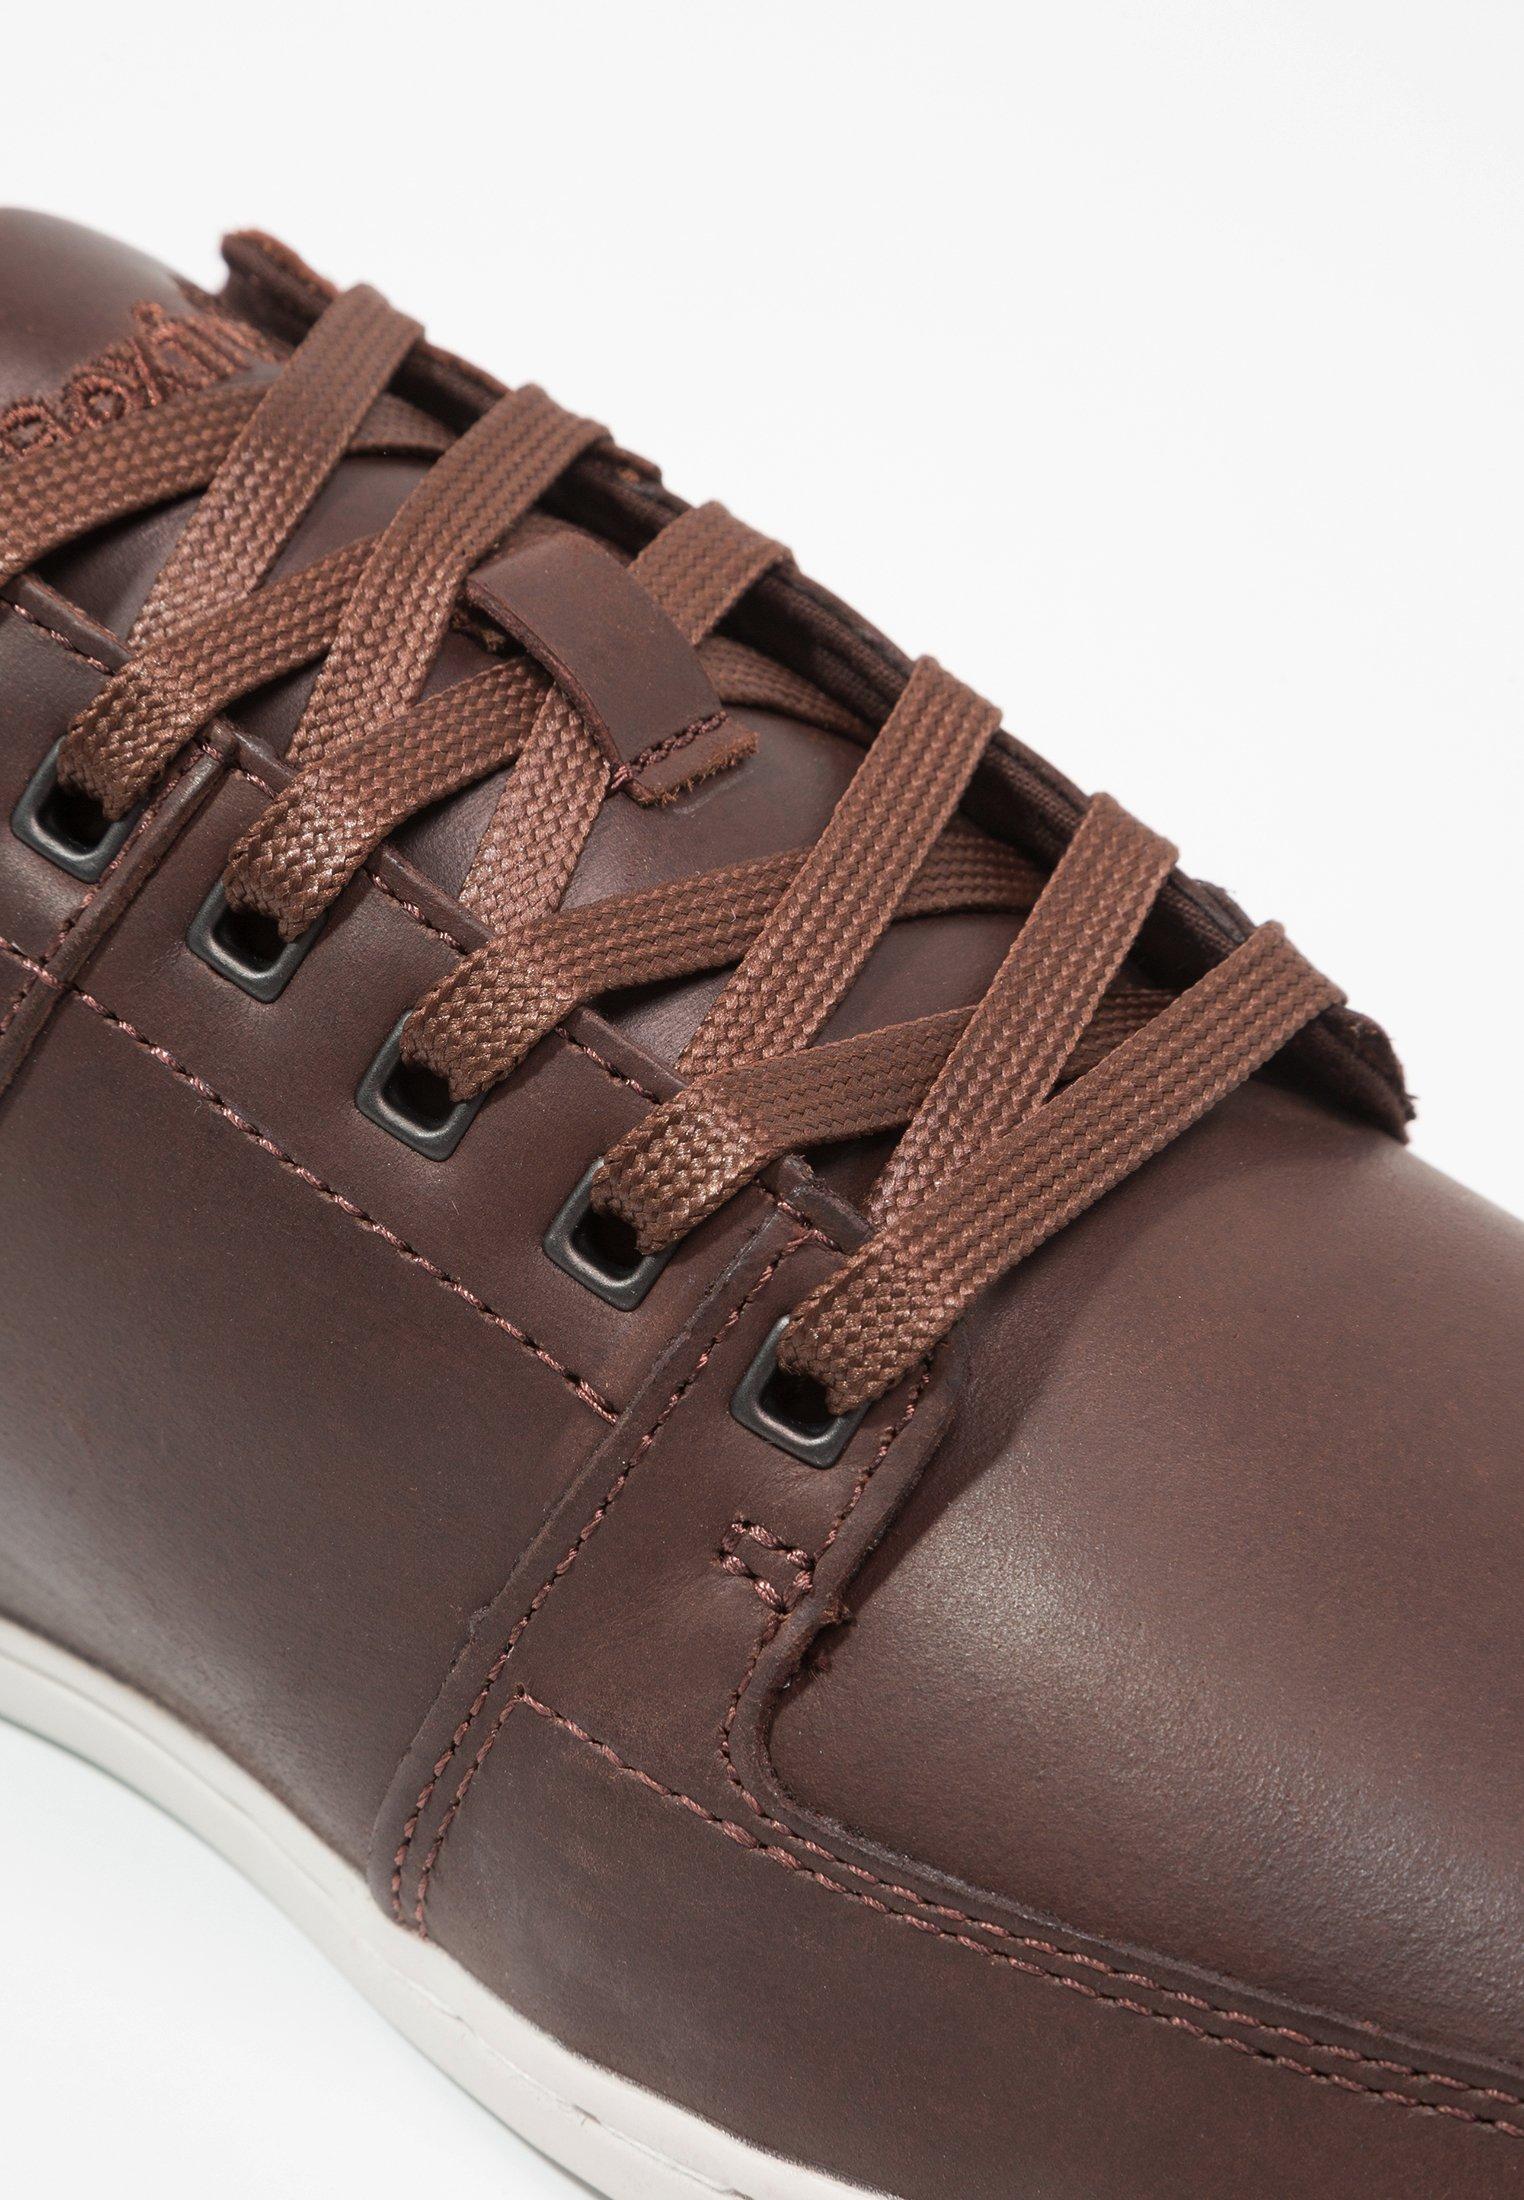 Bundle] Boxfresh Spencer Low Top Sneaker fashionable